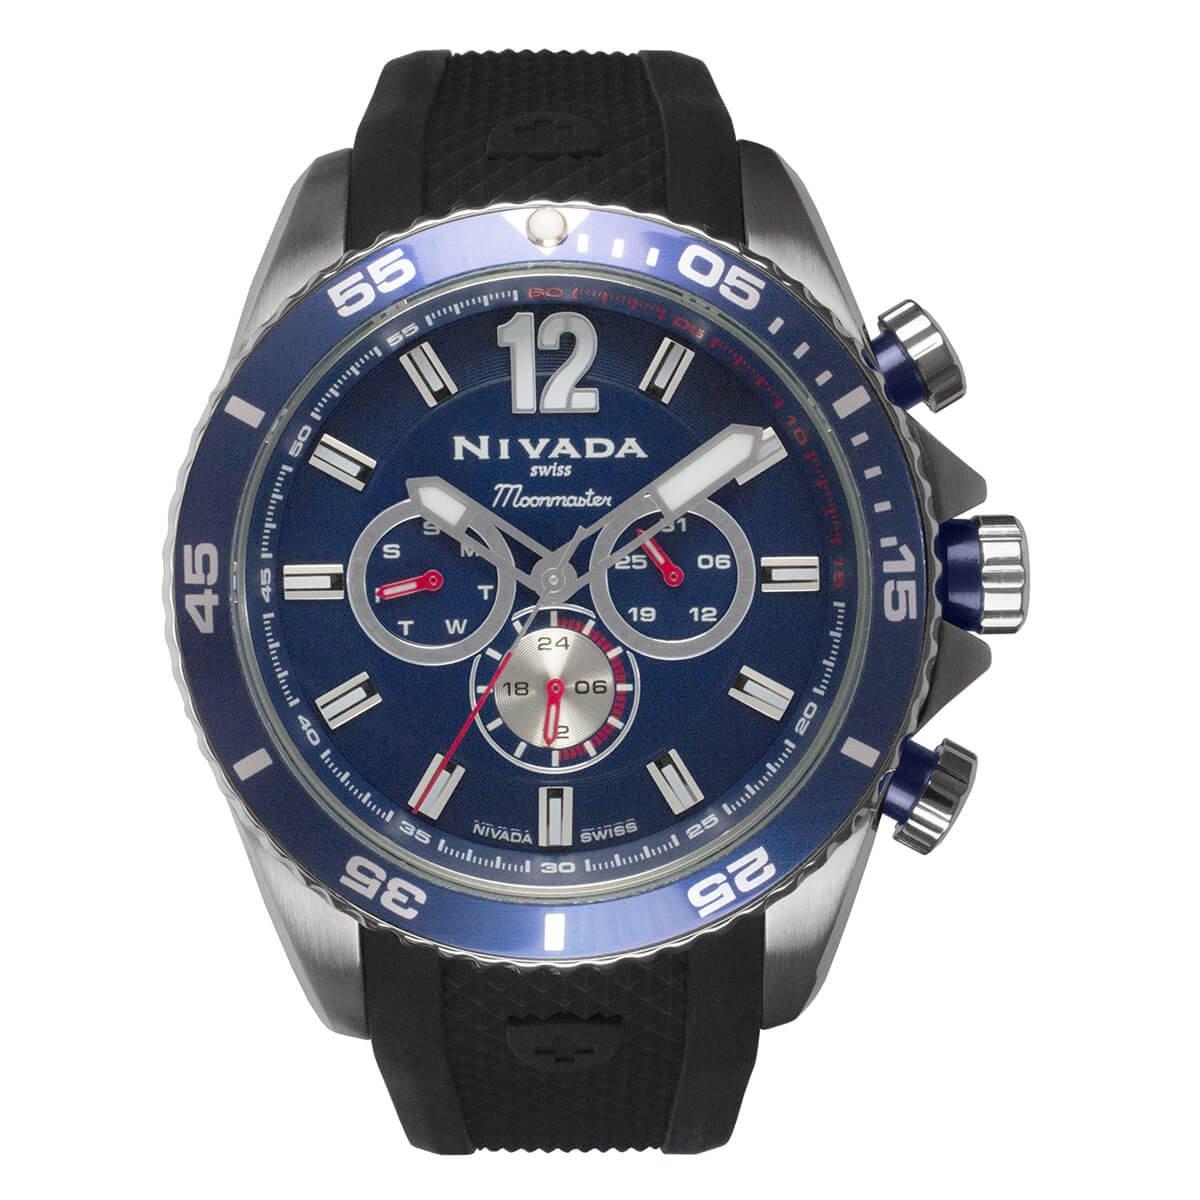 Reloj Caballero Nivada NP16507MACAA | SEARS.COM.MX - Me